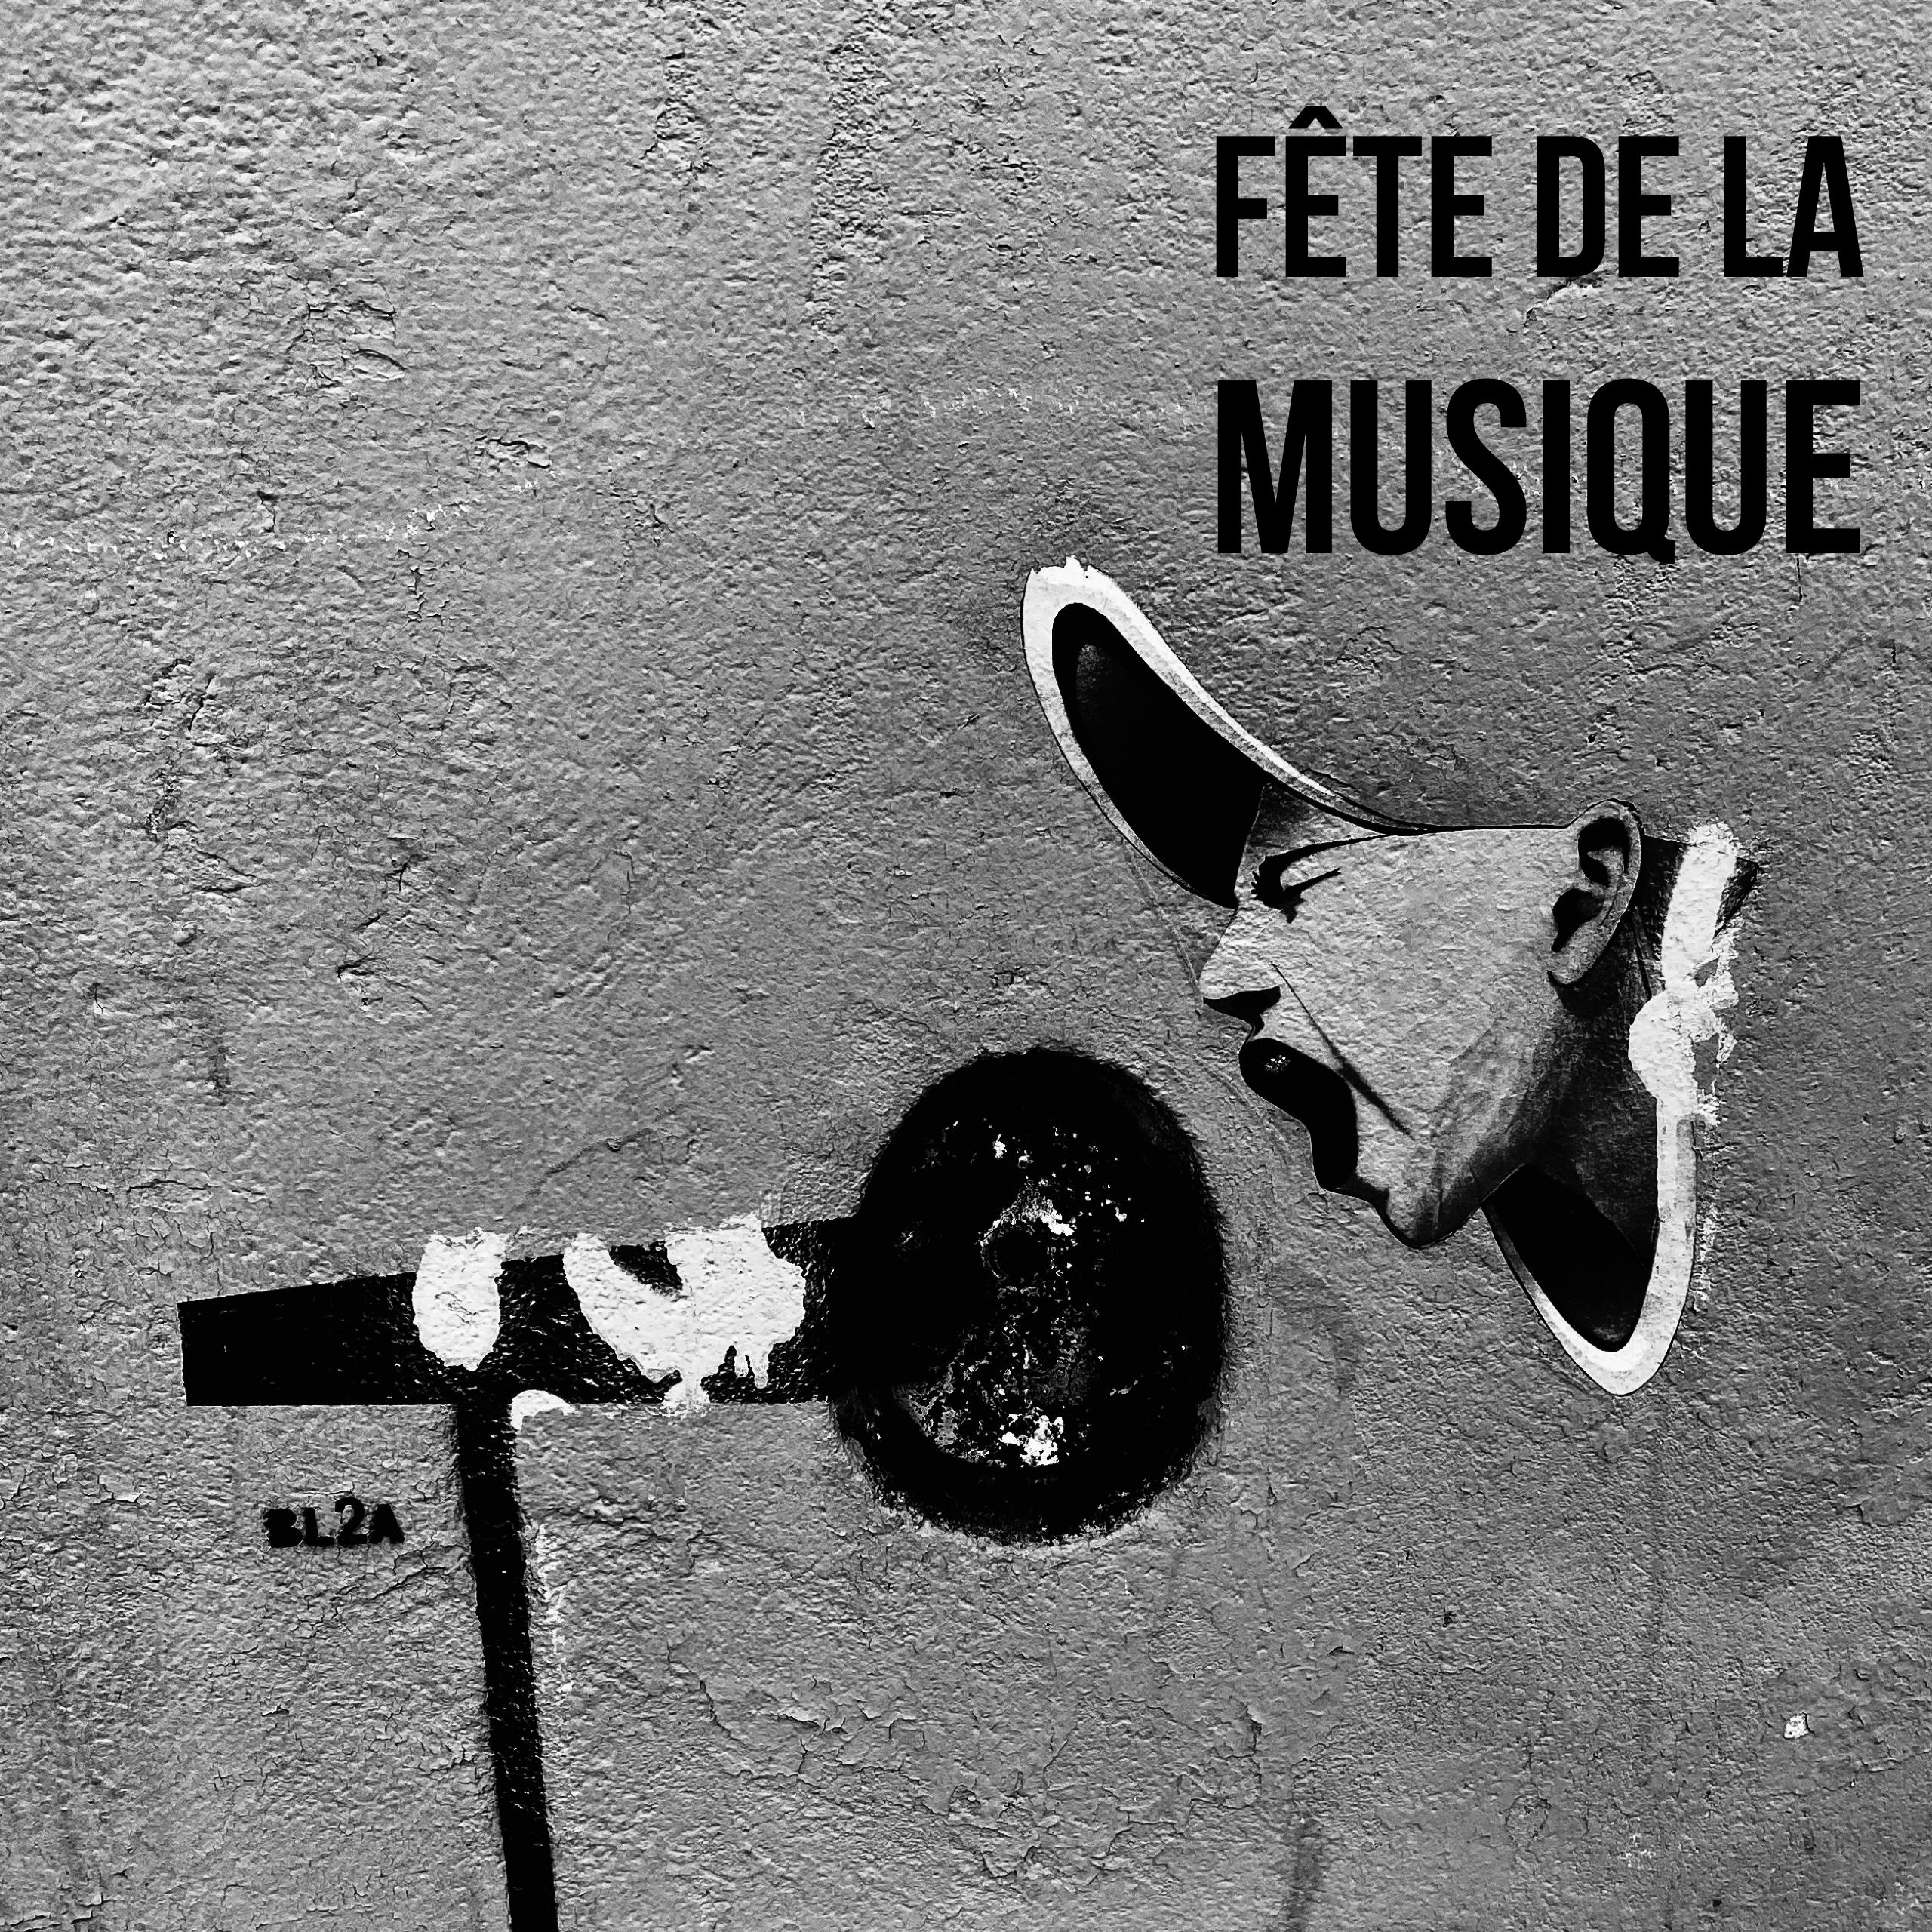 FÊTE DE LA MUSIQUE - DJ WAX X DJ DREAMS